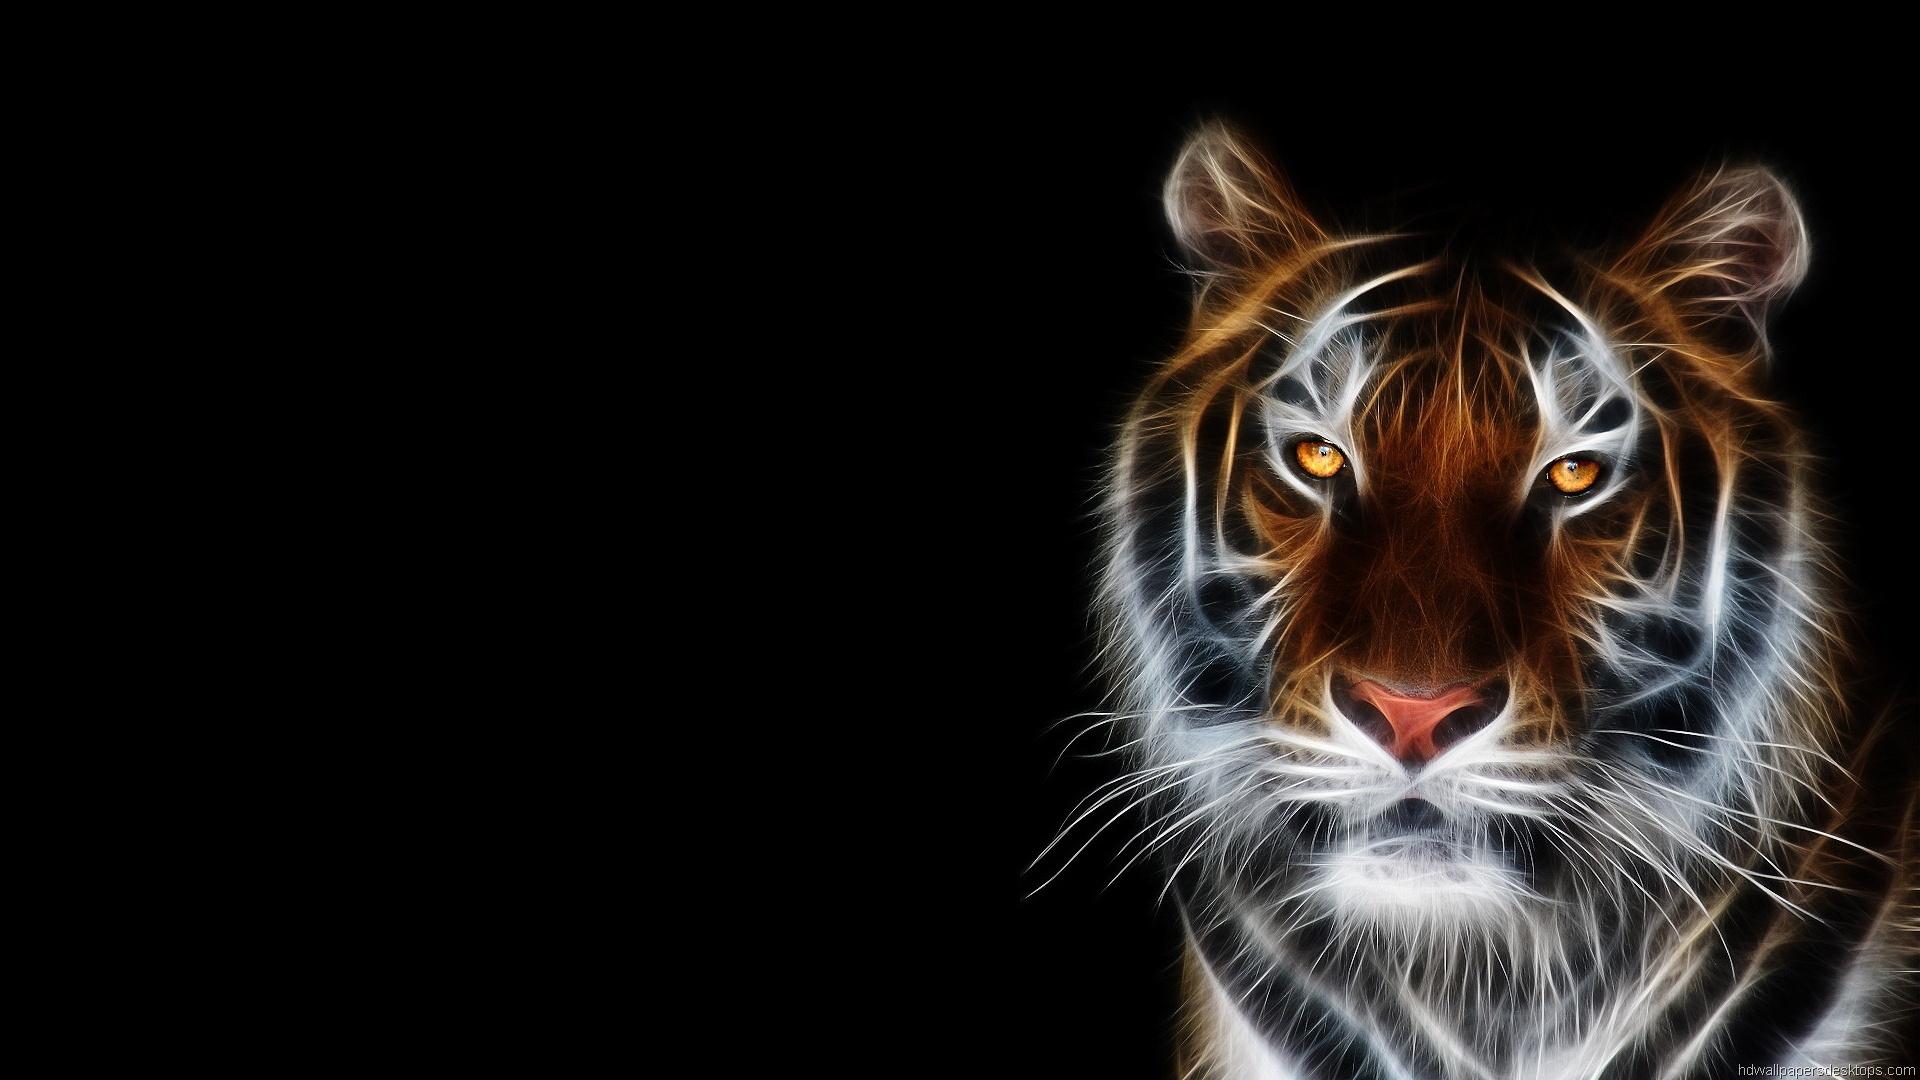 Animal Wallpapers and Backgrounds - WallpaperSafari